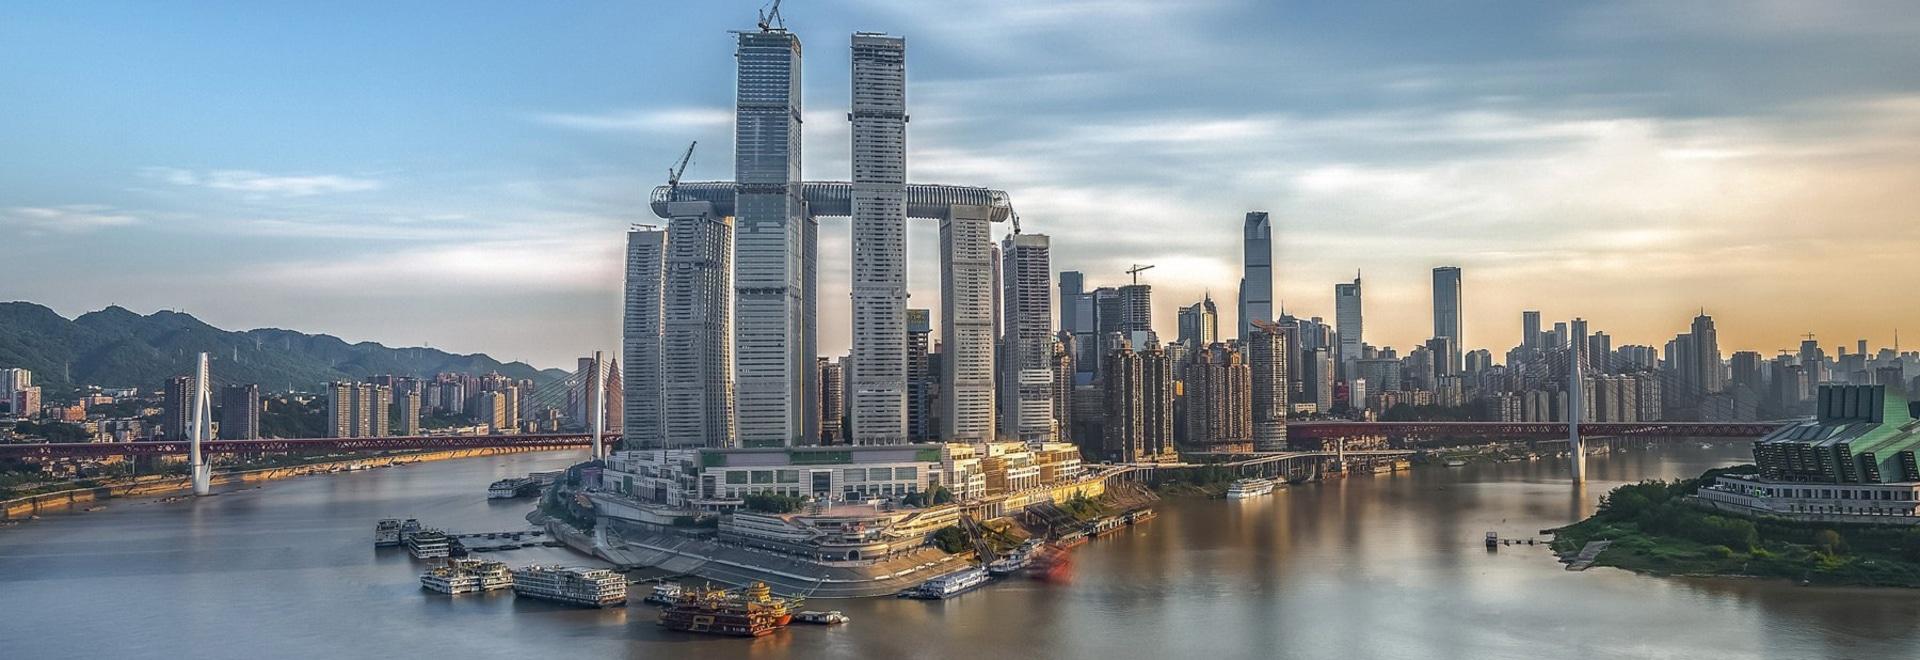 safdie architects' monumental'raffles city chongqing' commence son ouverture progressive en chine